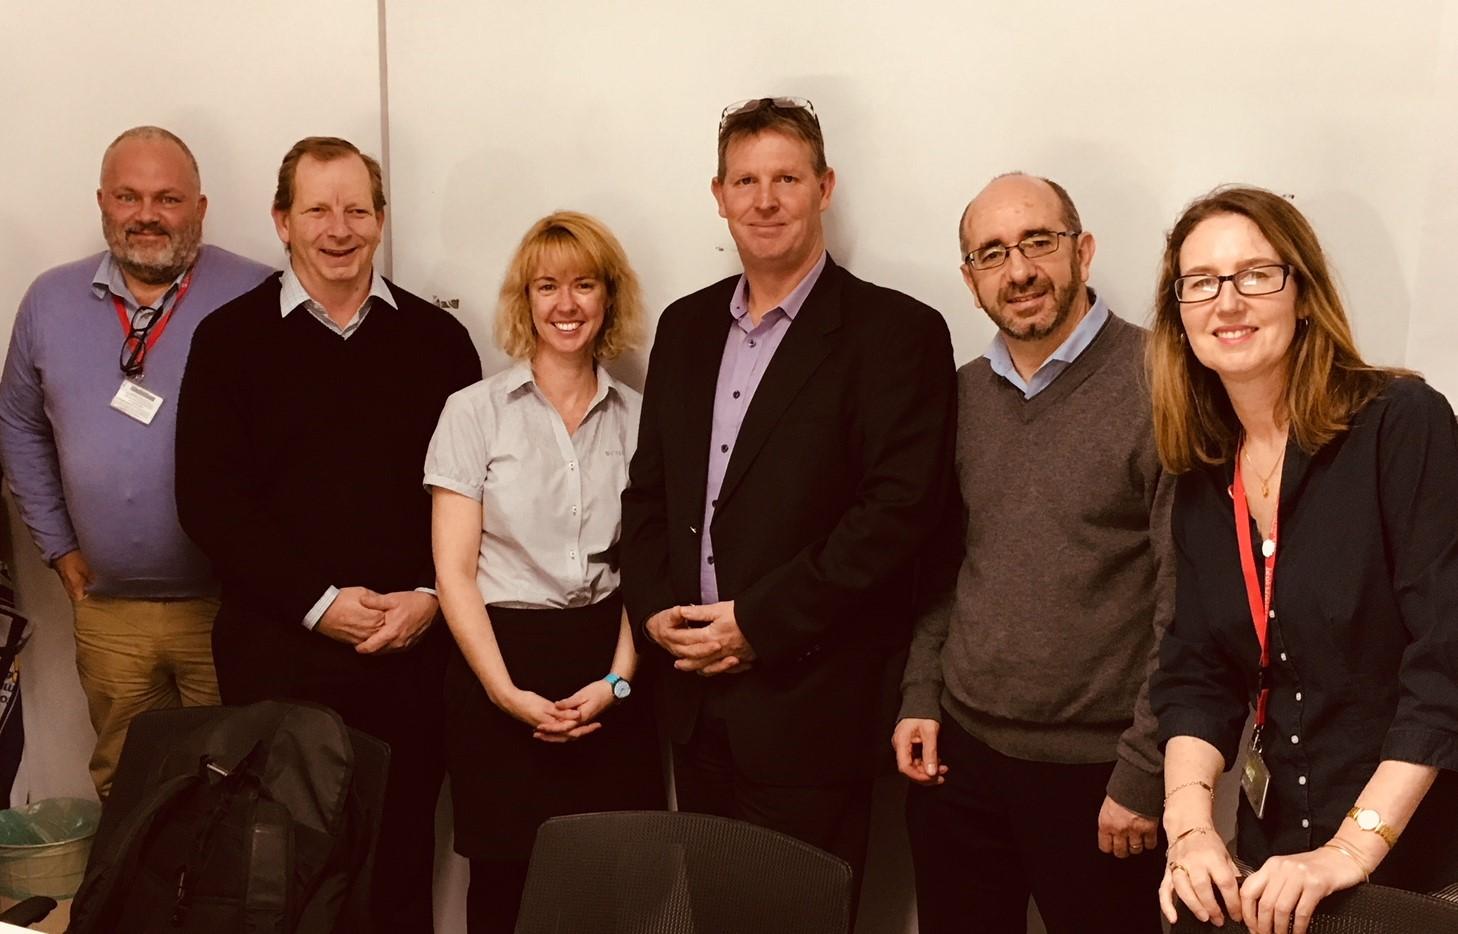 LiFE workshop (left) Kym Witney-Soanes, Bryan Baillie, Steve Wakem, Lyndal Jones, Paul McLeod, Bernadette Crombie, Davin Kendall and Ed Maher